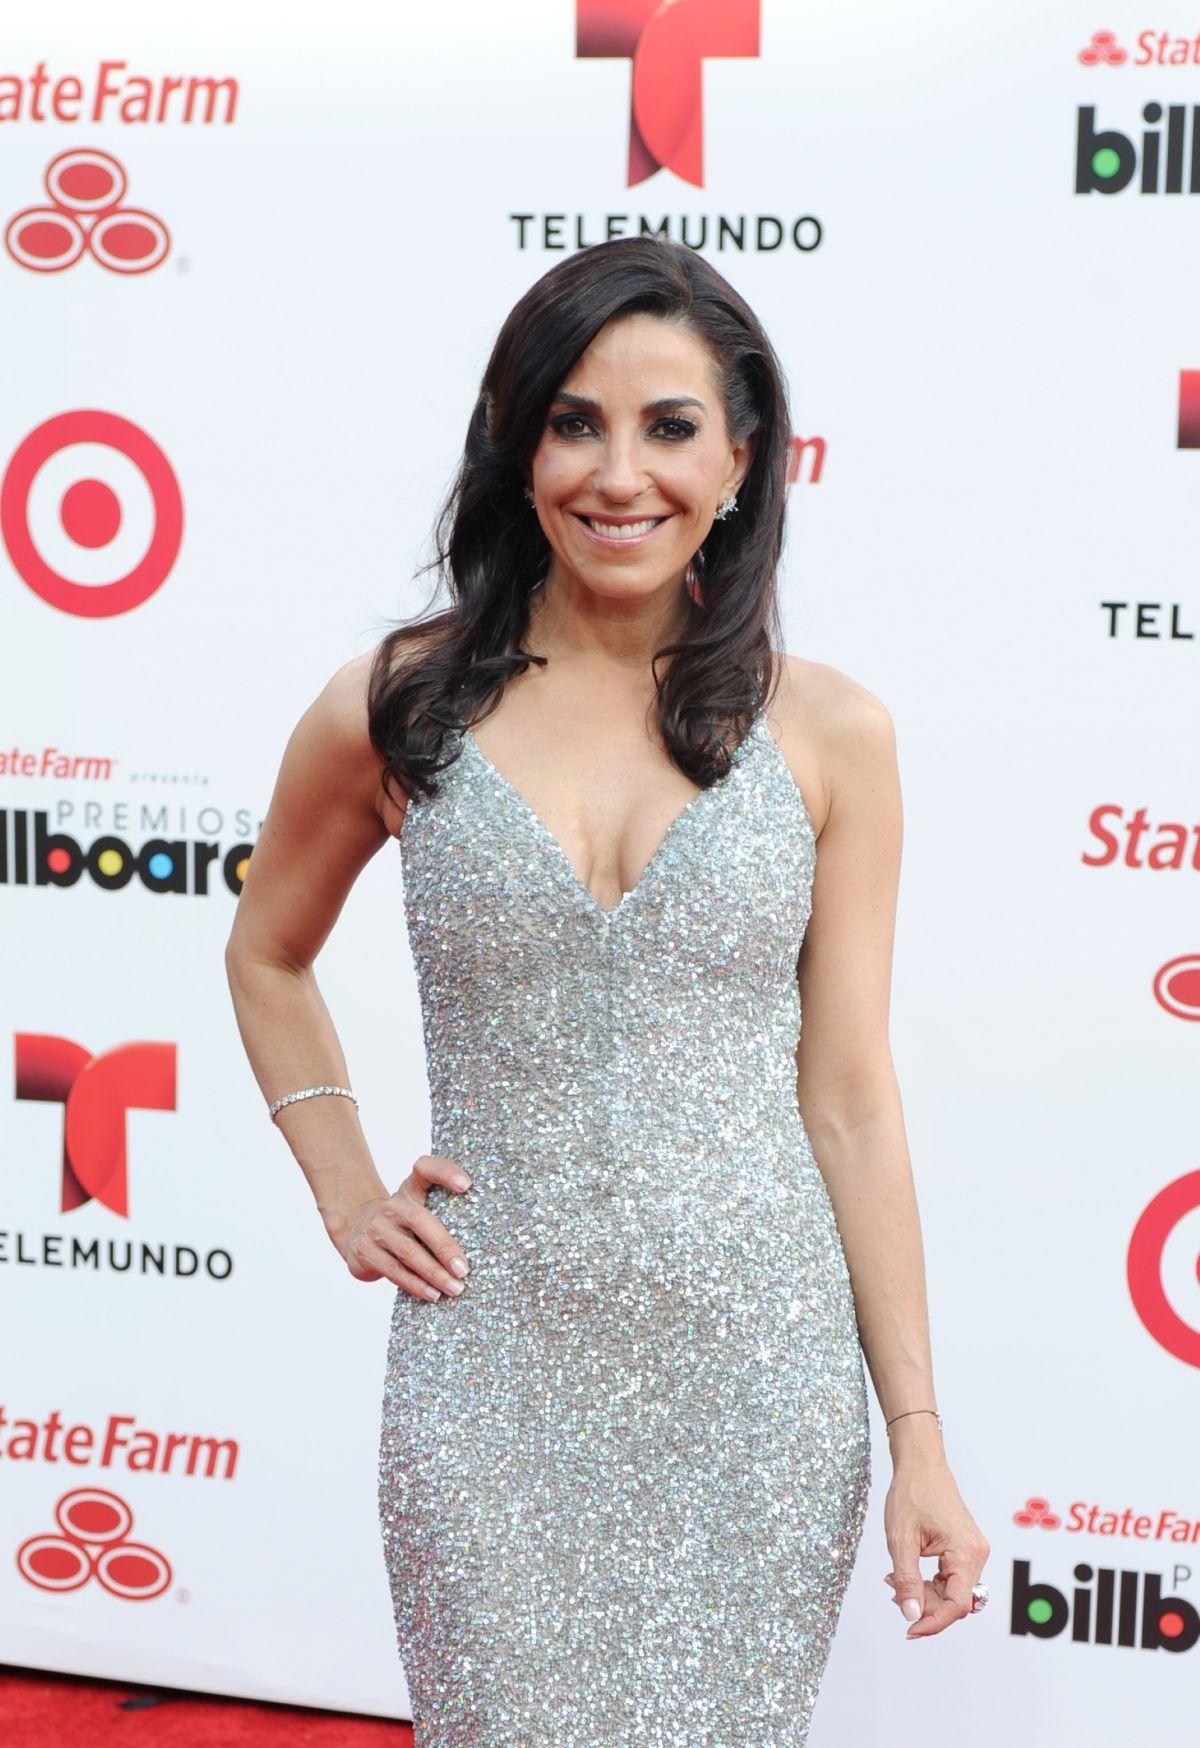 KIKA ROCHA at 2014 Billboard Latin Music Awards in Miami